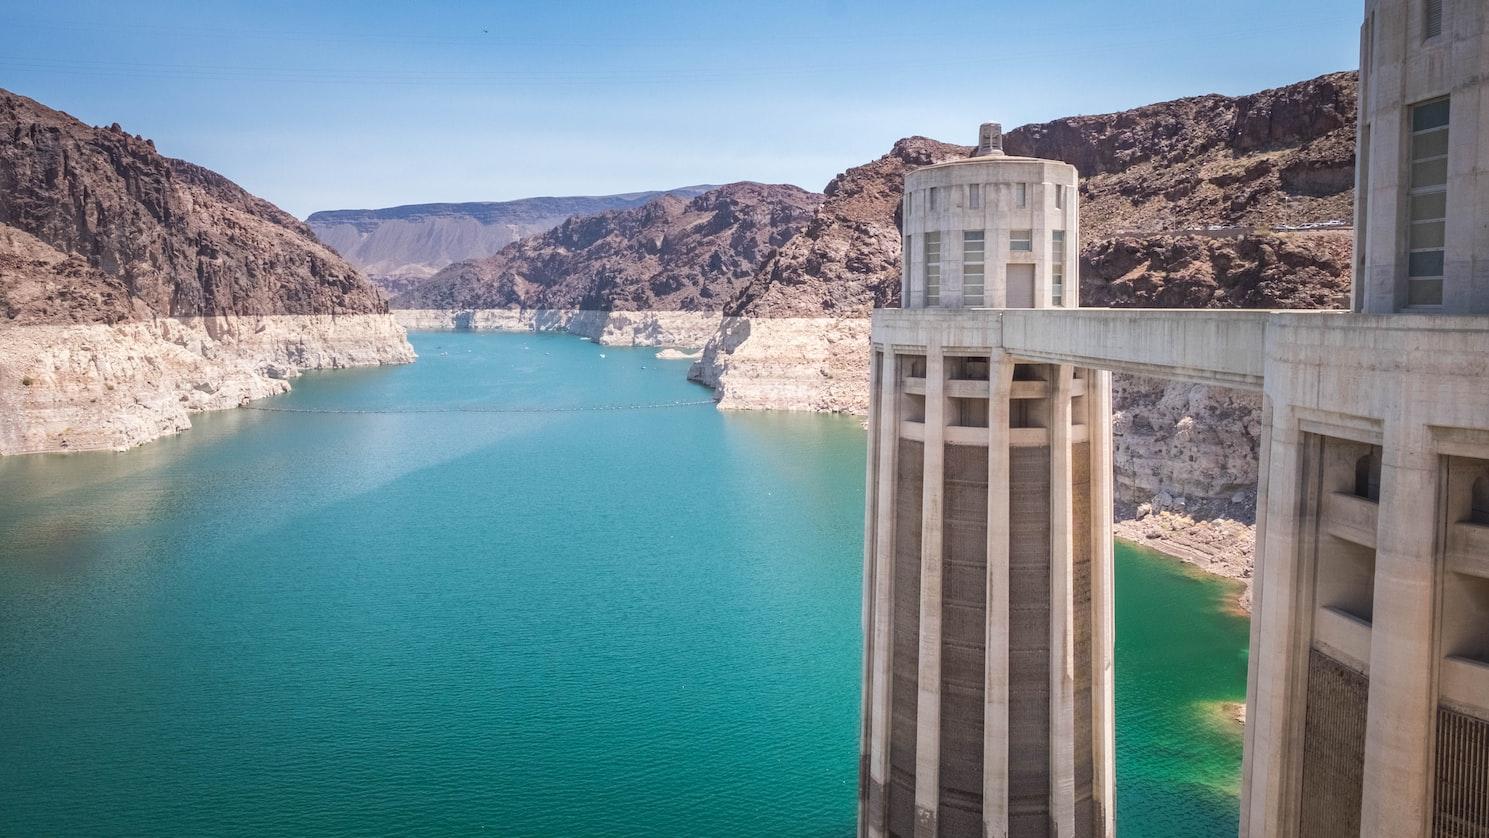 Hoover Dam from Las Vegas